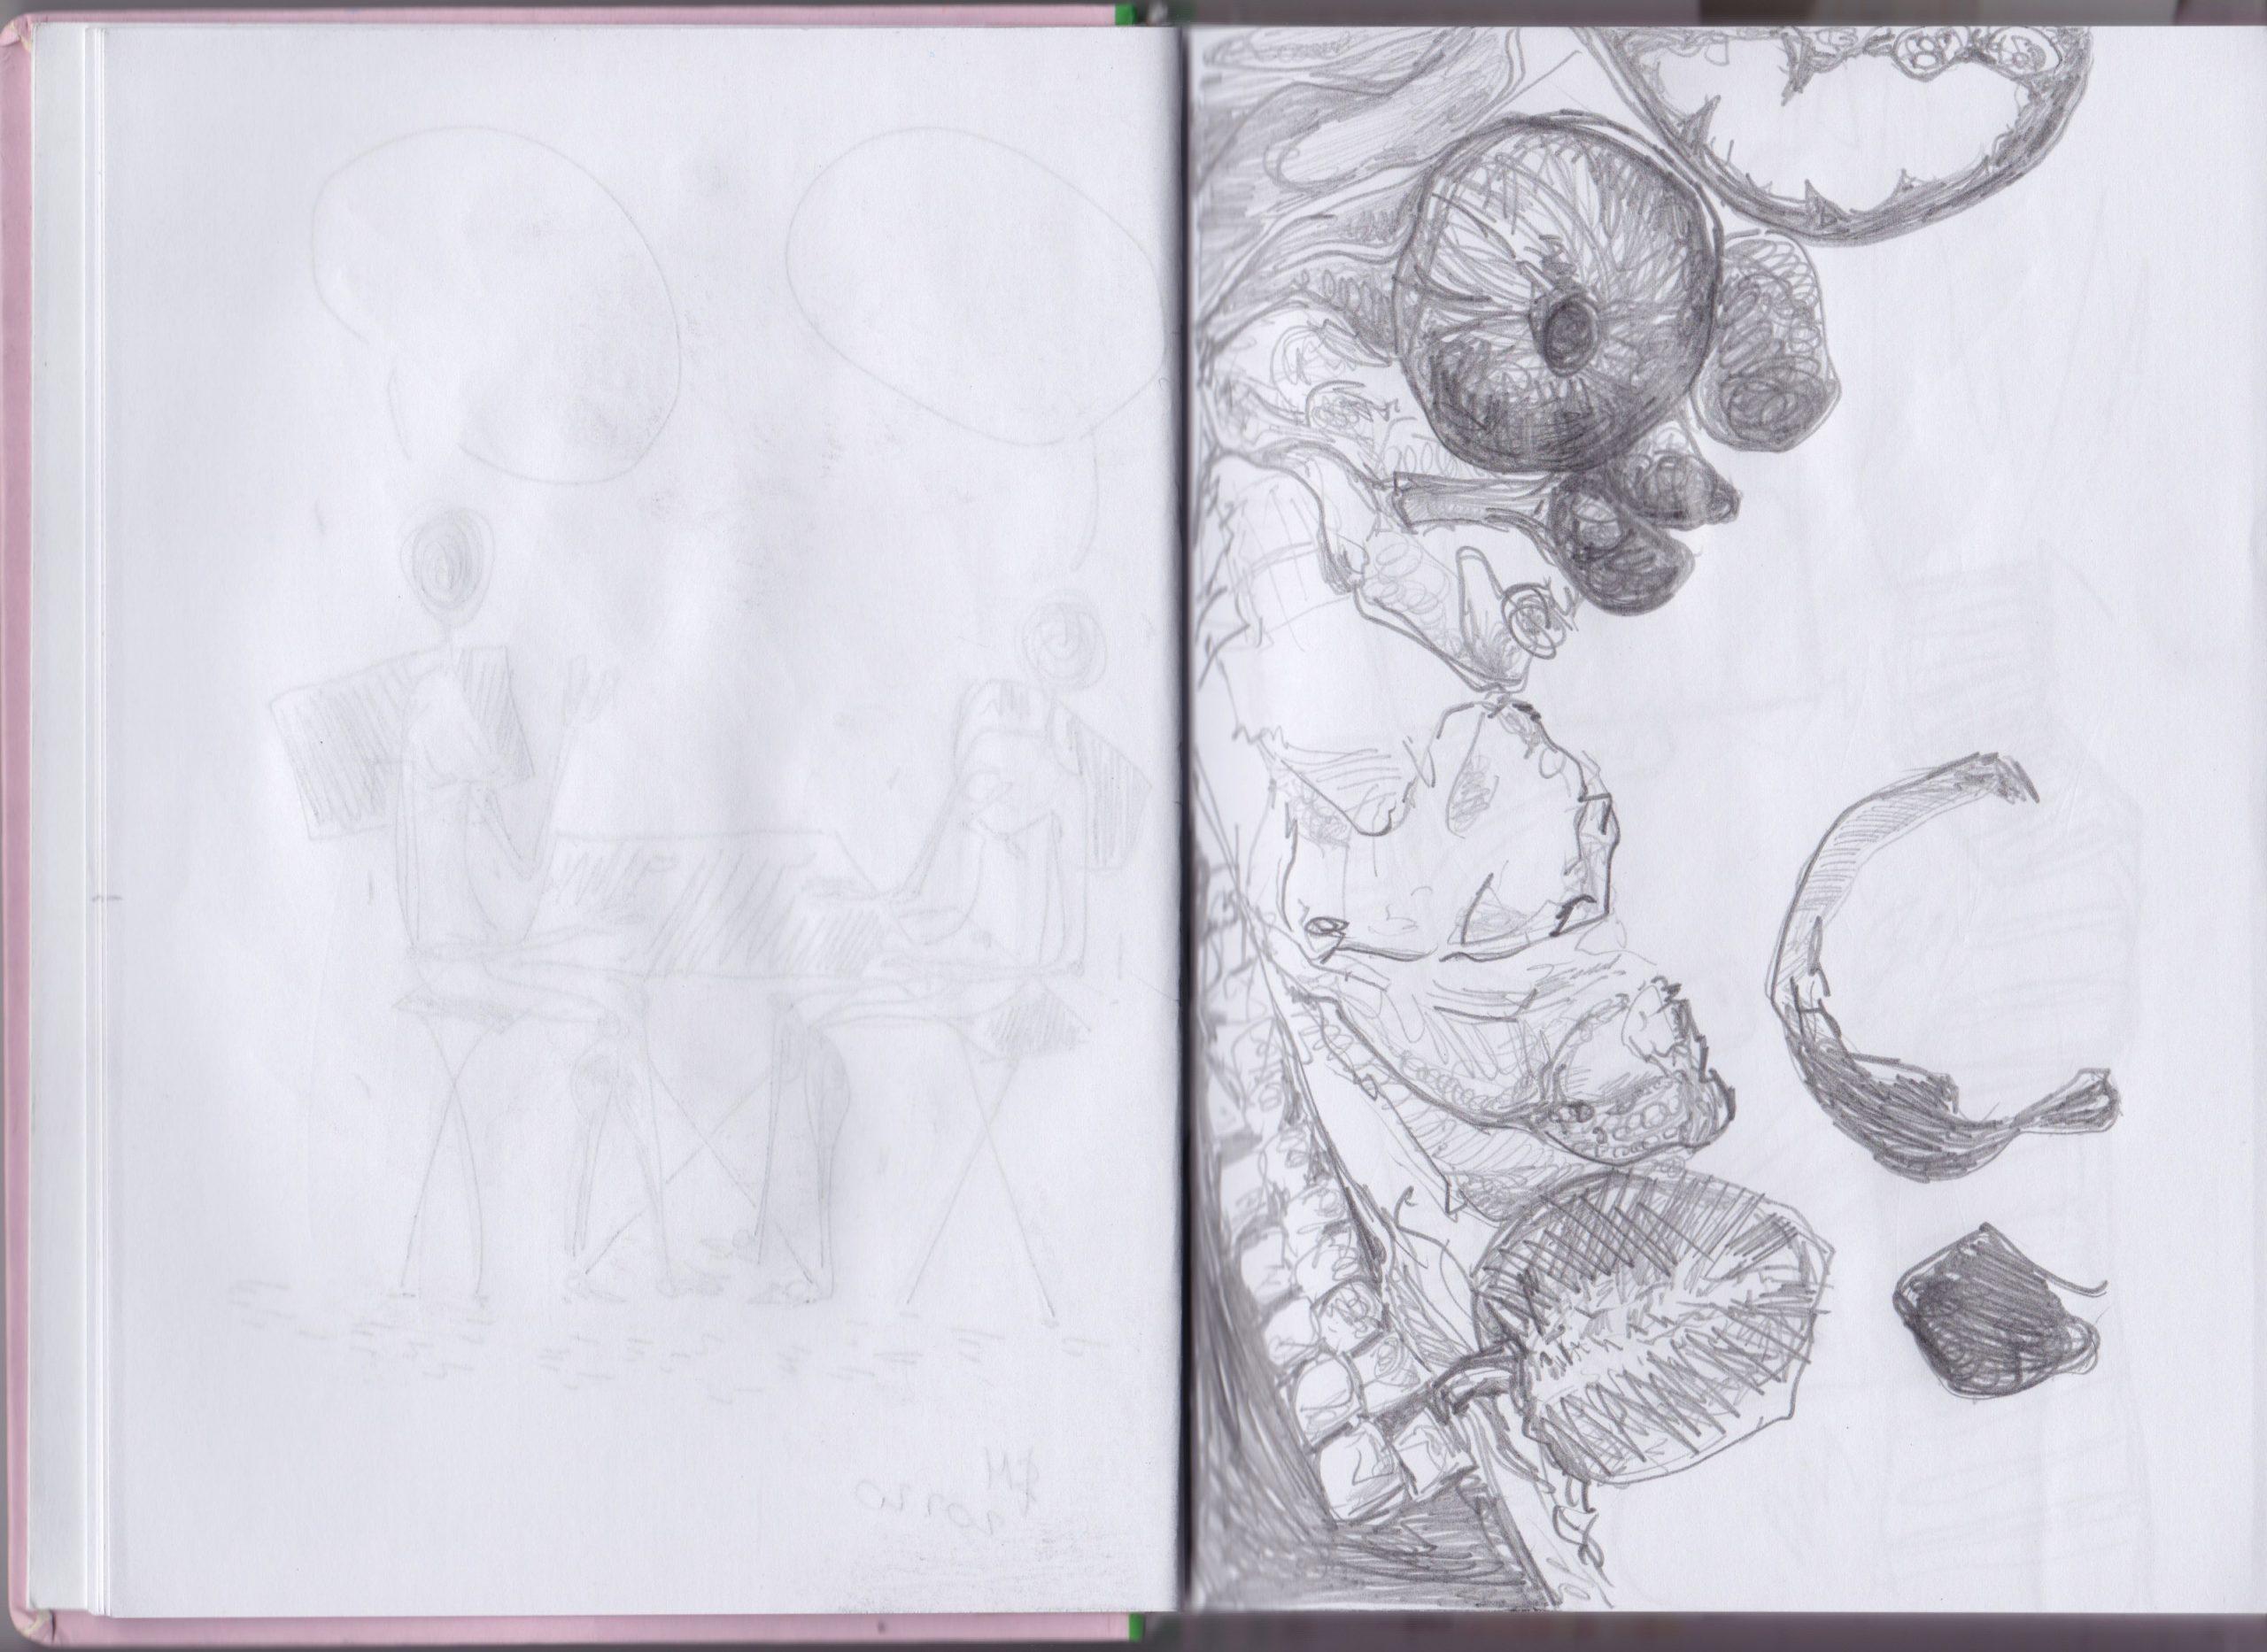 Art journal   Sketches    10 way to Improve your sketchbook